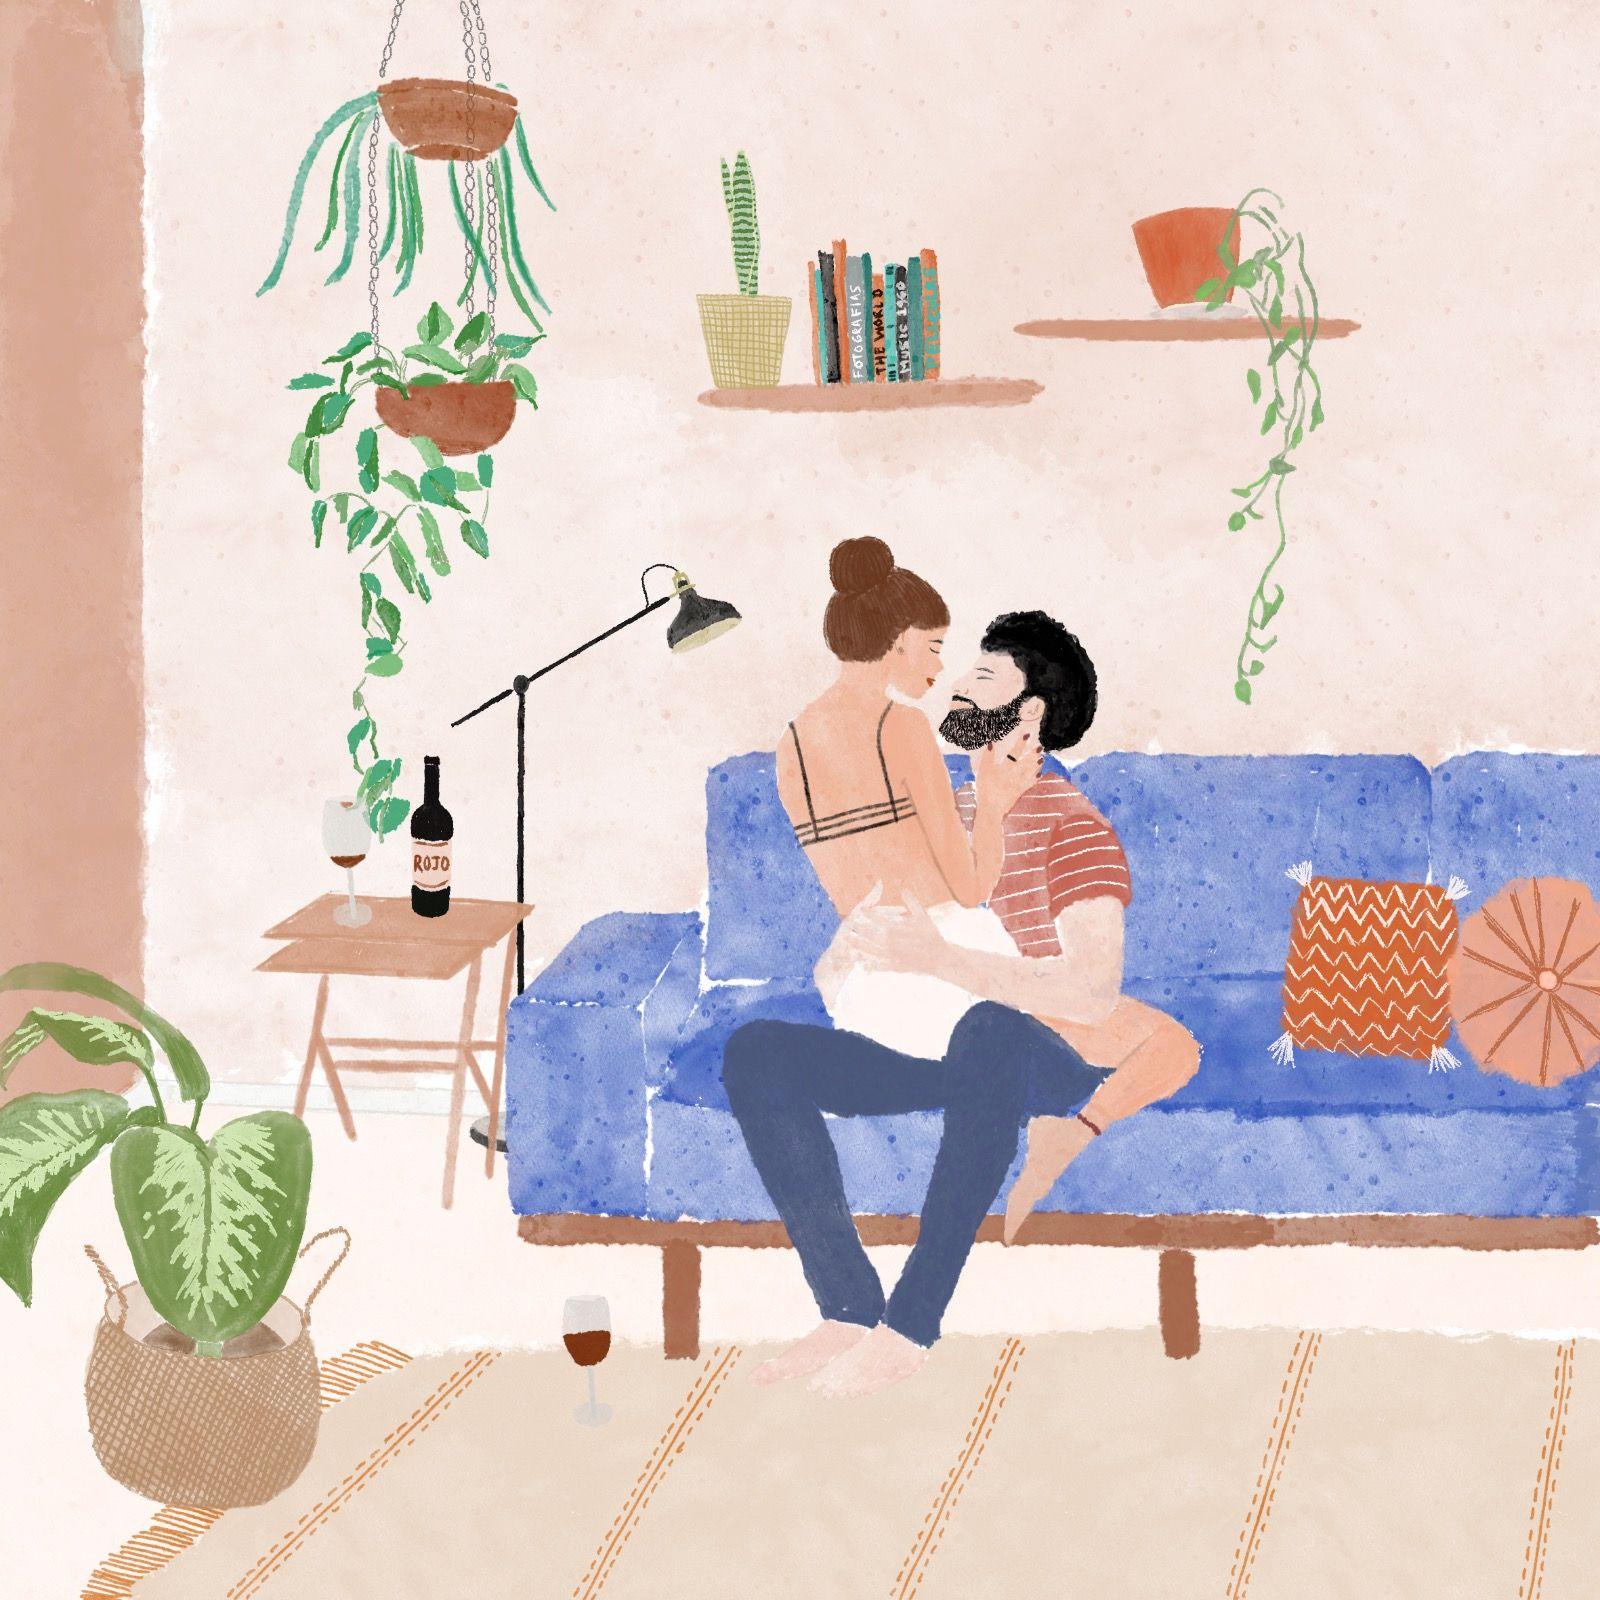 Stay home illustration (@deborachodik) in 2020